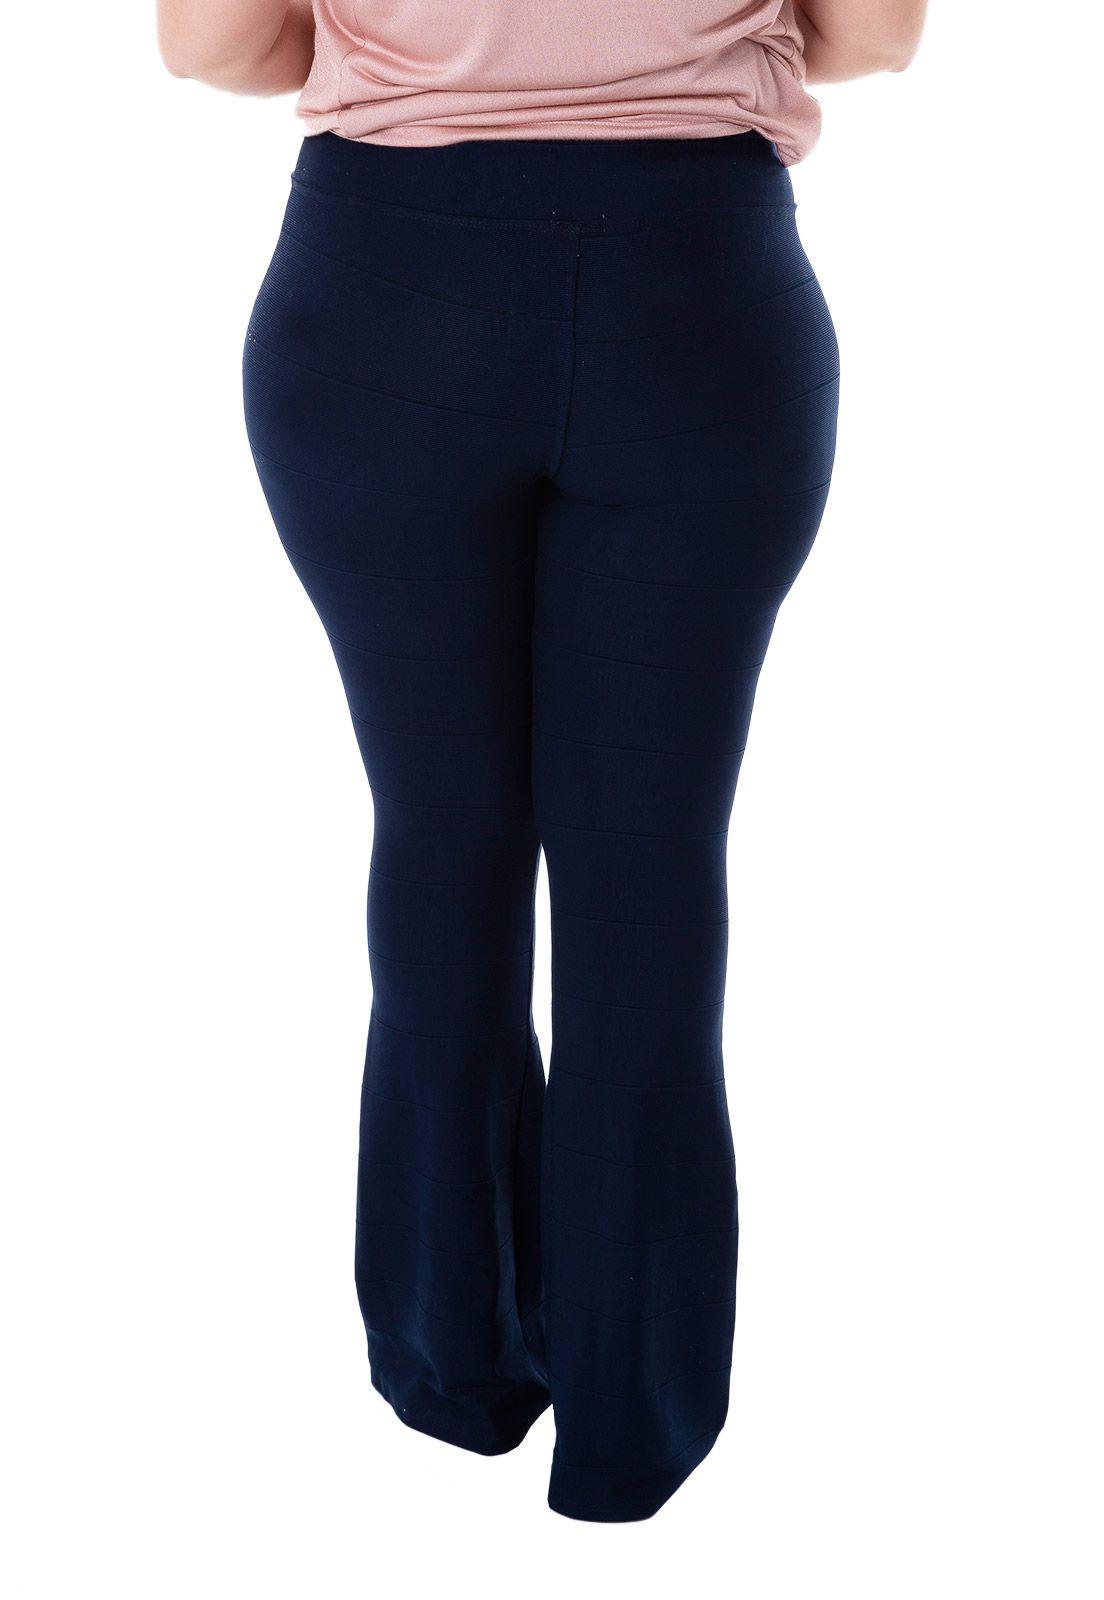 Calça Bandagem plus size azul marinho